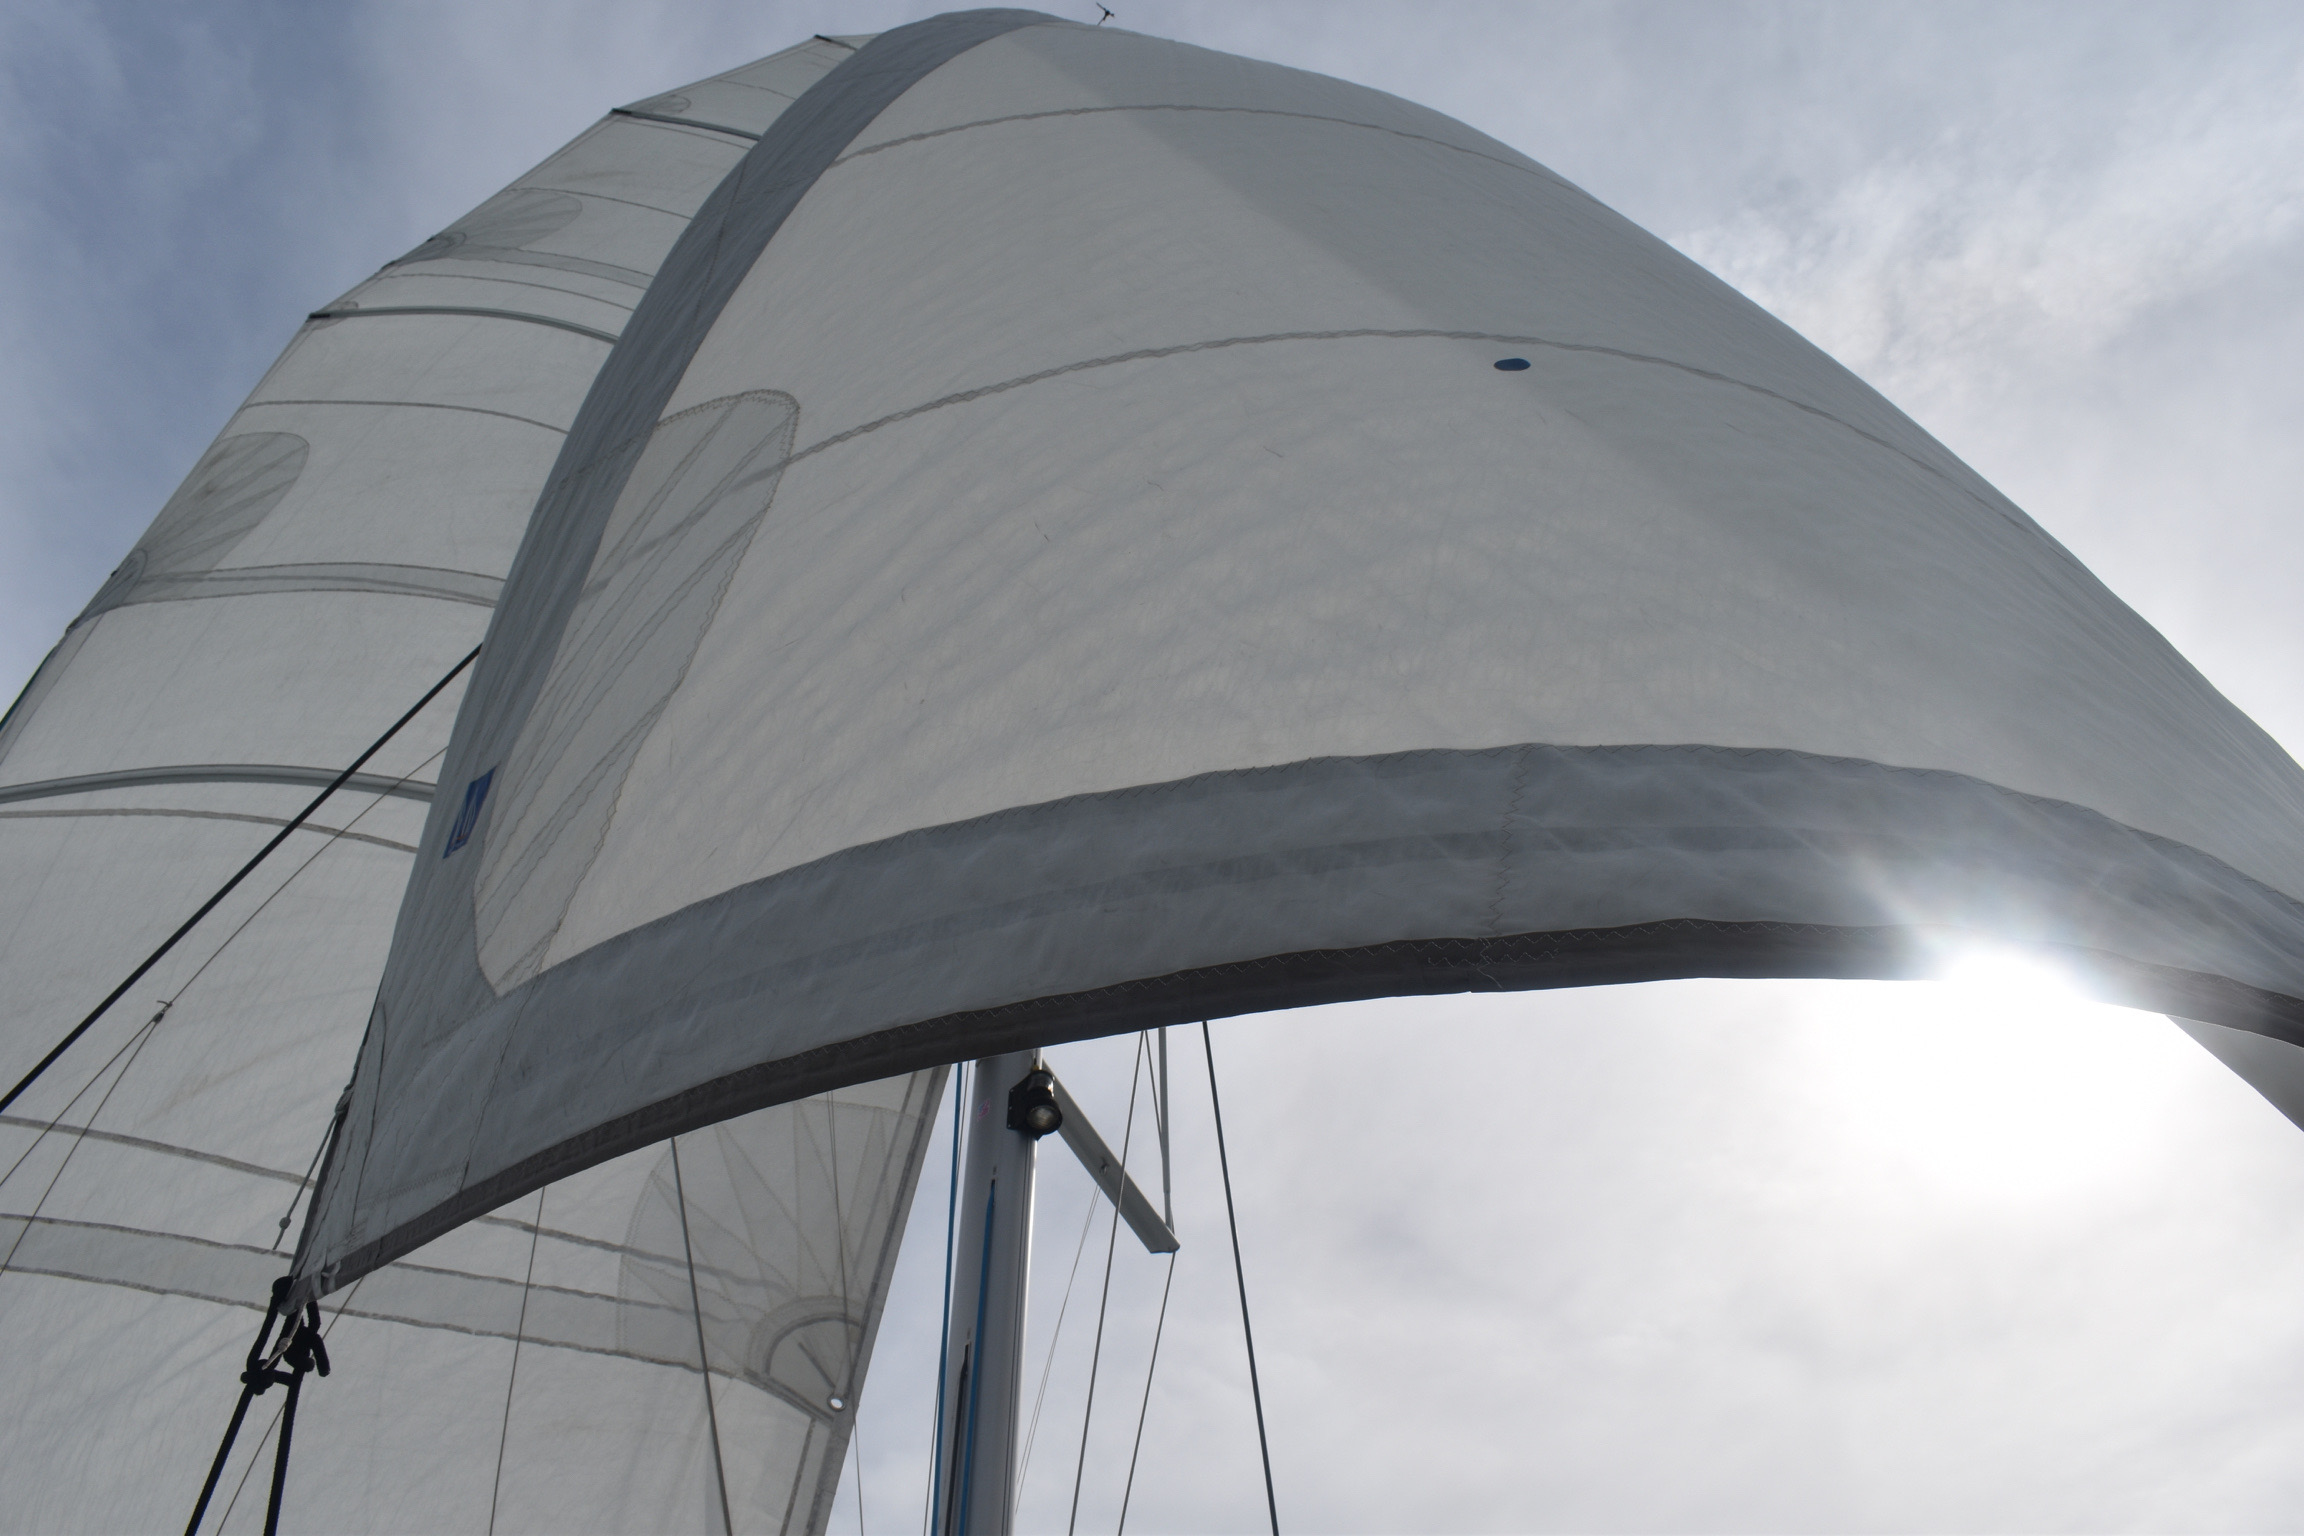 Luxury Day Sailing in St. Petersburg, FL